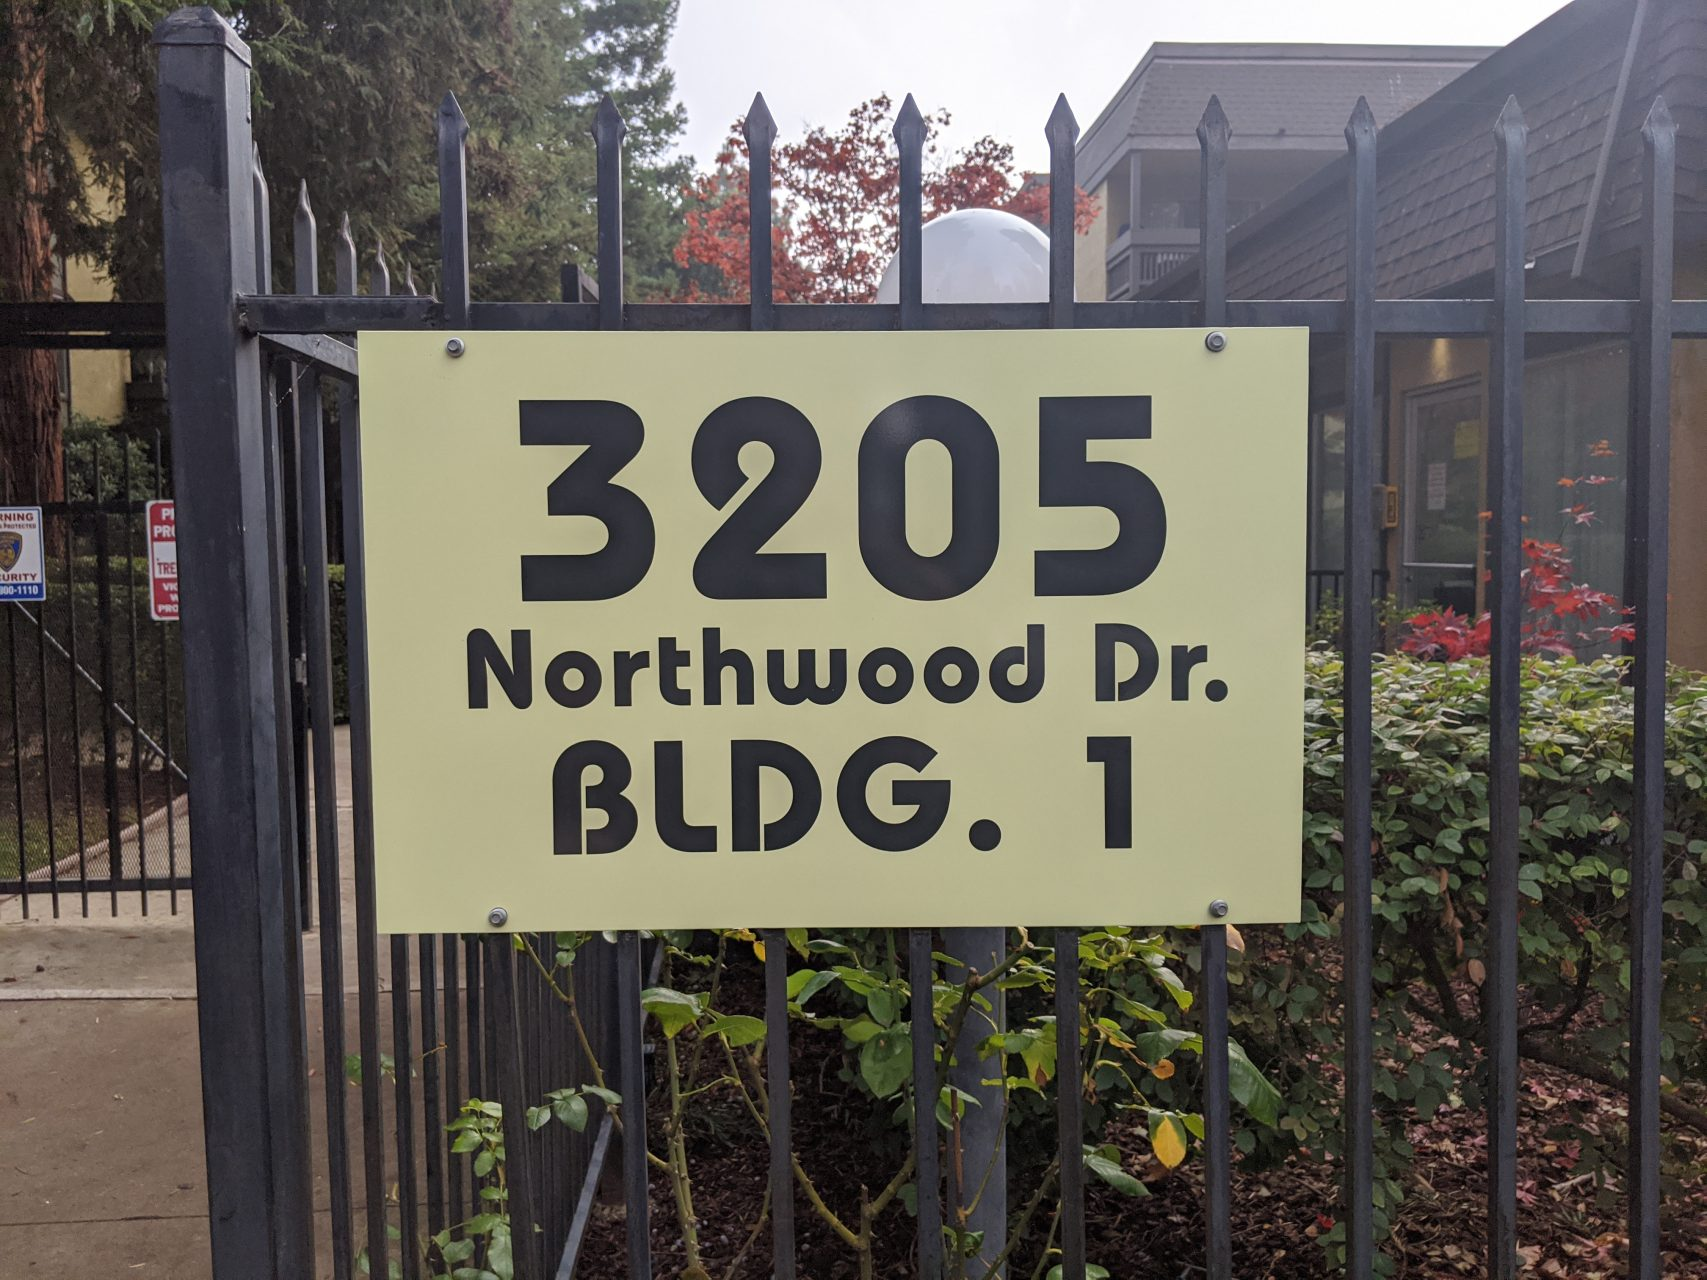 Building Identification Signs - Sequoia Signs Orinda